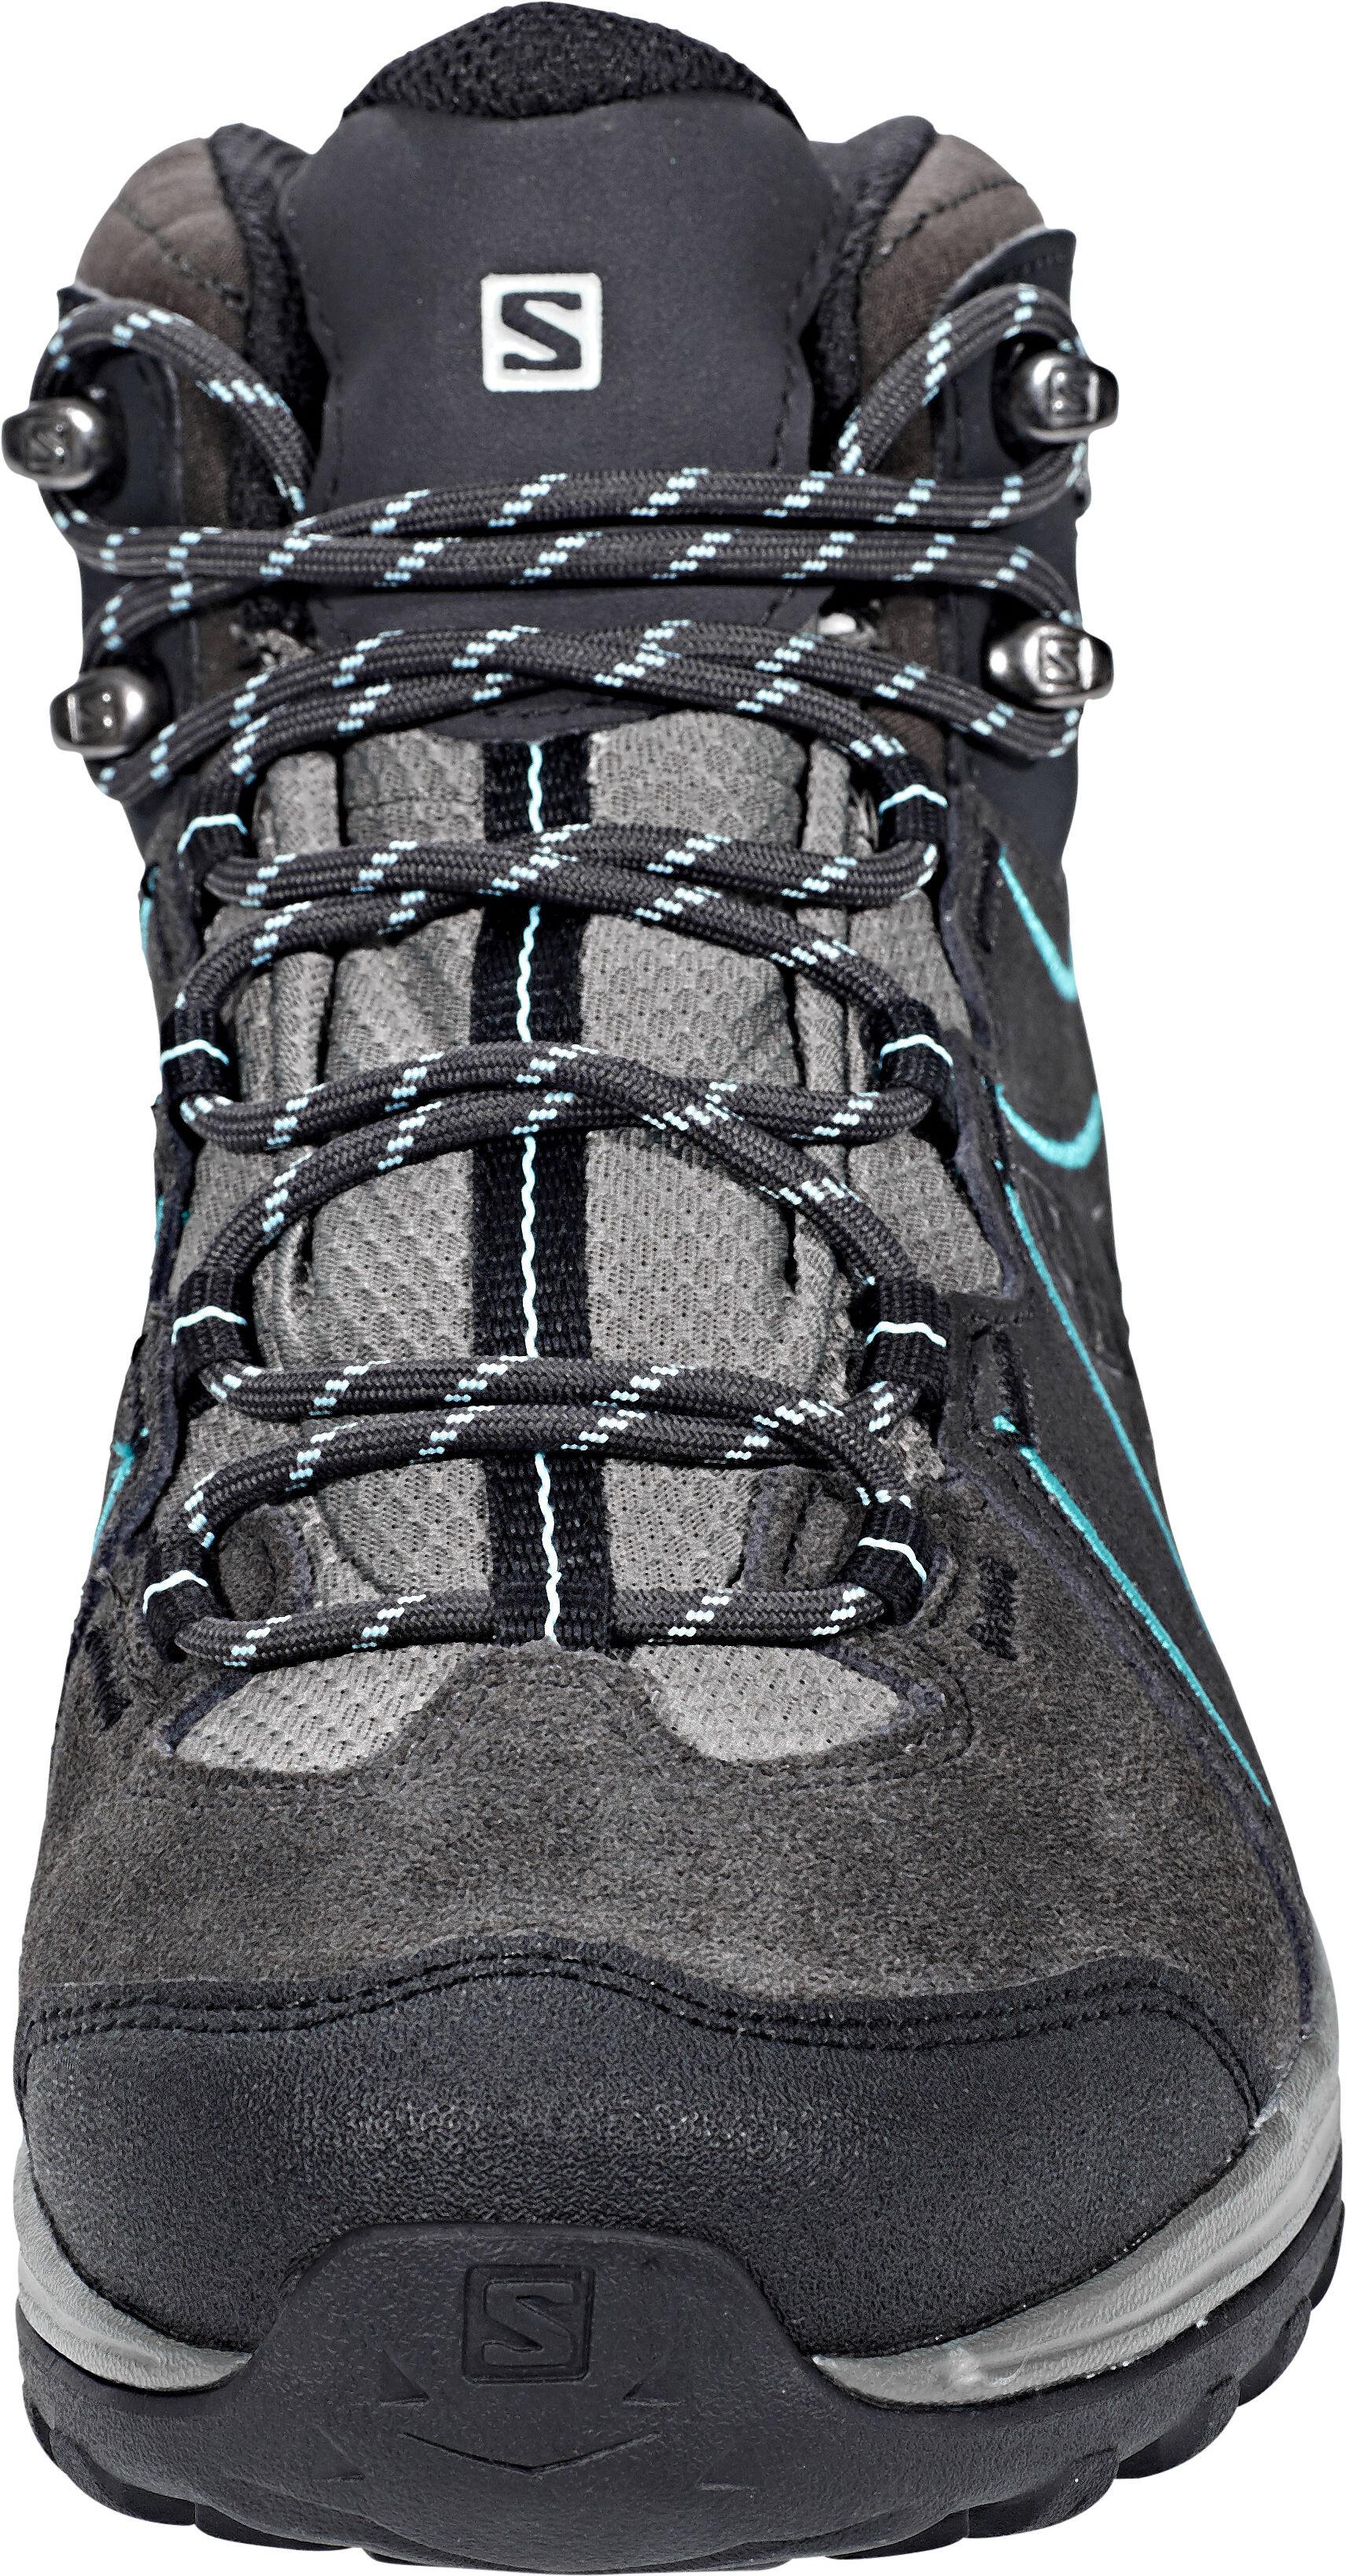 091703d7 Salomon Ellipse 2 Mid LTR GTX Shoes Women phantom/castor gray/aruba blue